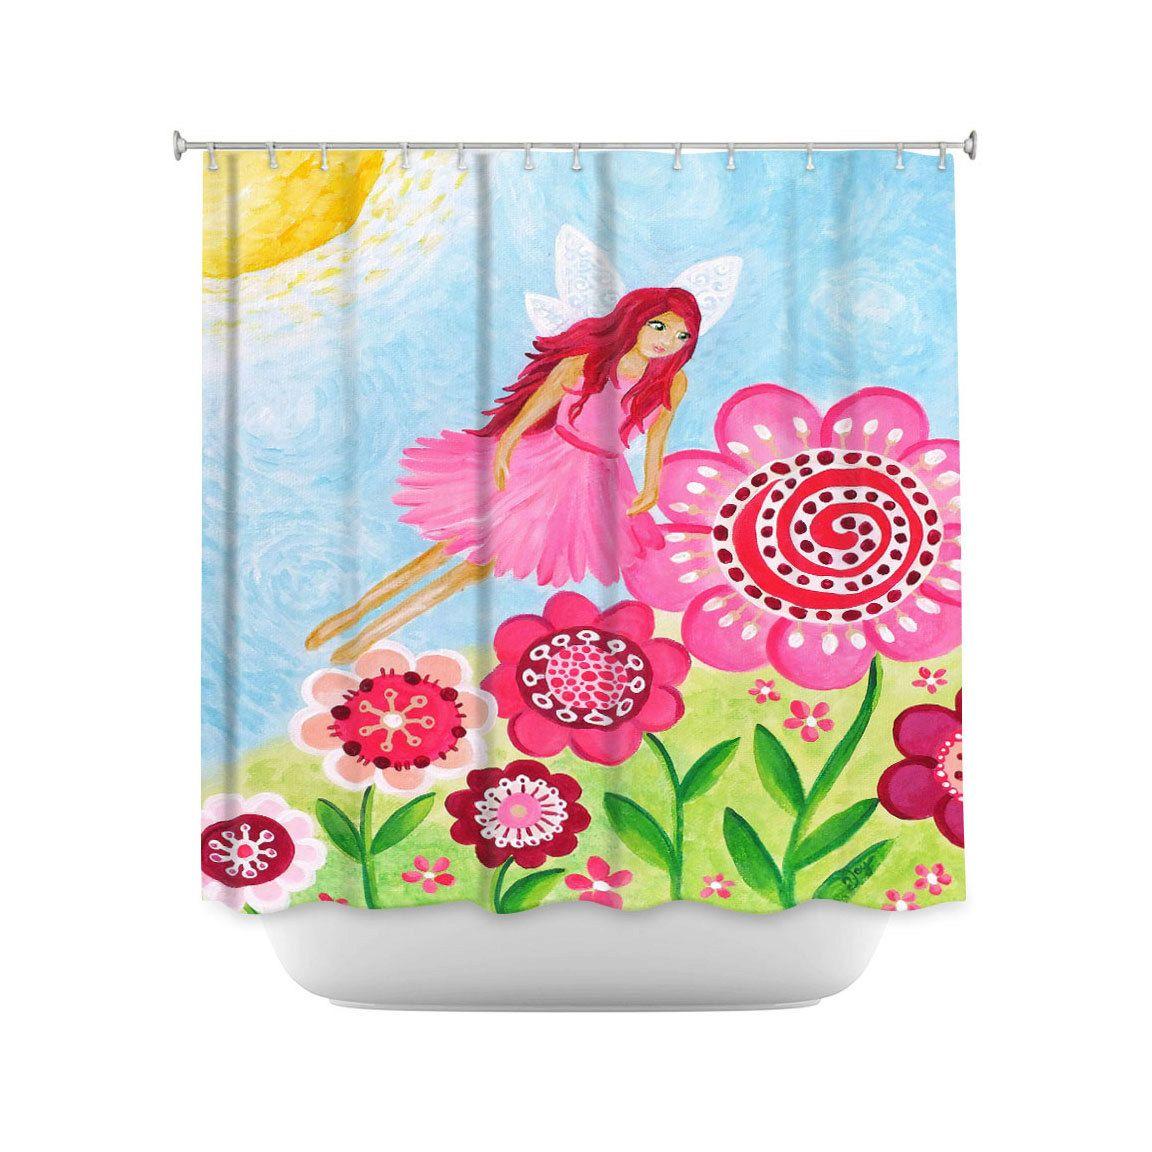 Pink Flower Fairy Shower Curtain Childrens Decor Pink Bathroom Decor